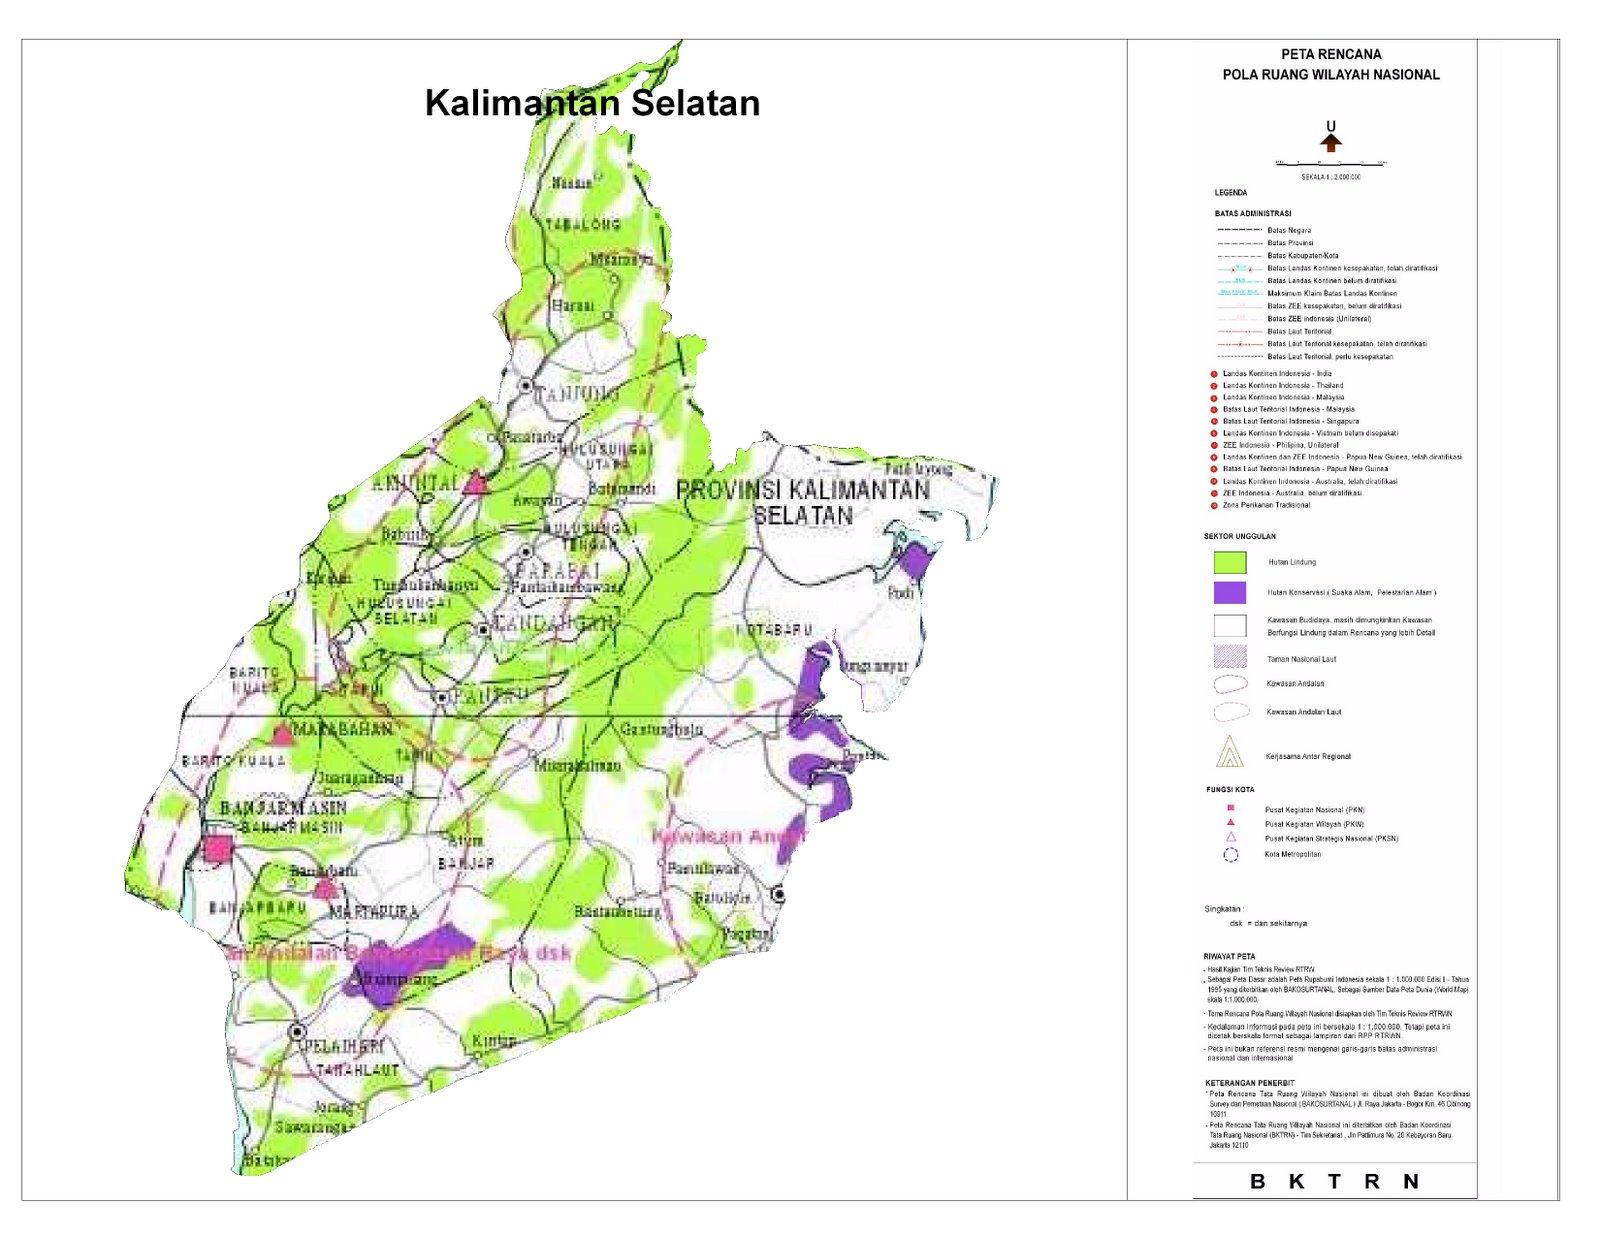 Proyeksi RTWN Terhadap Provinsi Kalimantan Selatan